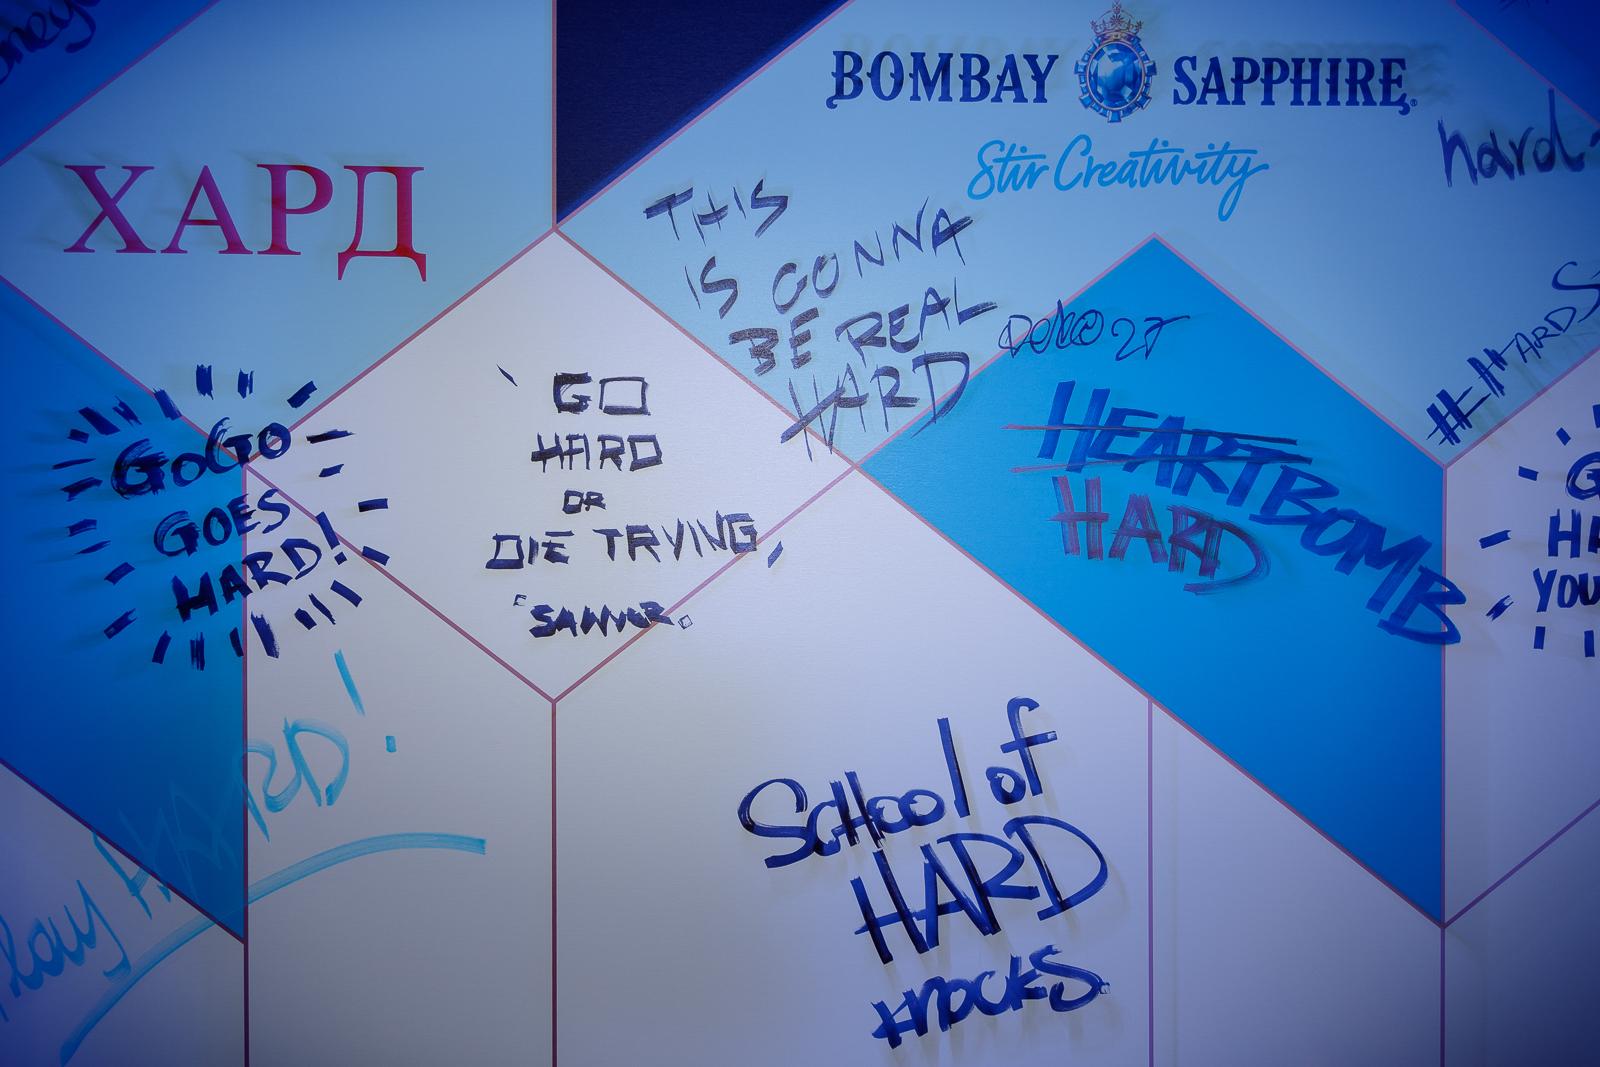 Amvyx Hard Clo celebrates 1 year with Bombay Sapphire